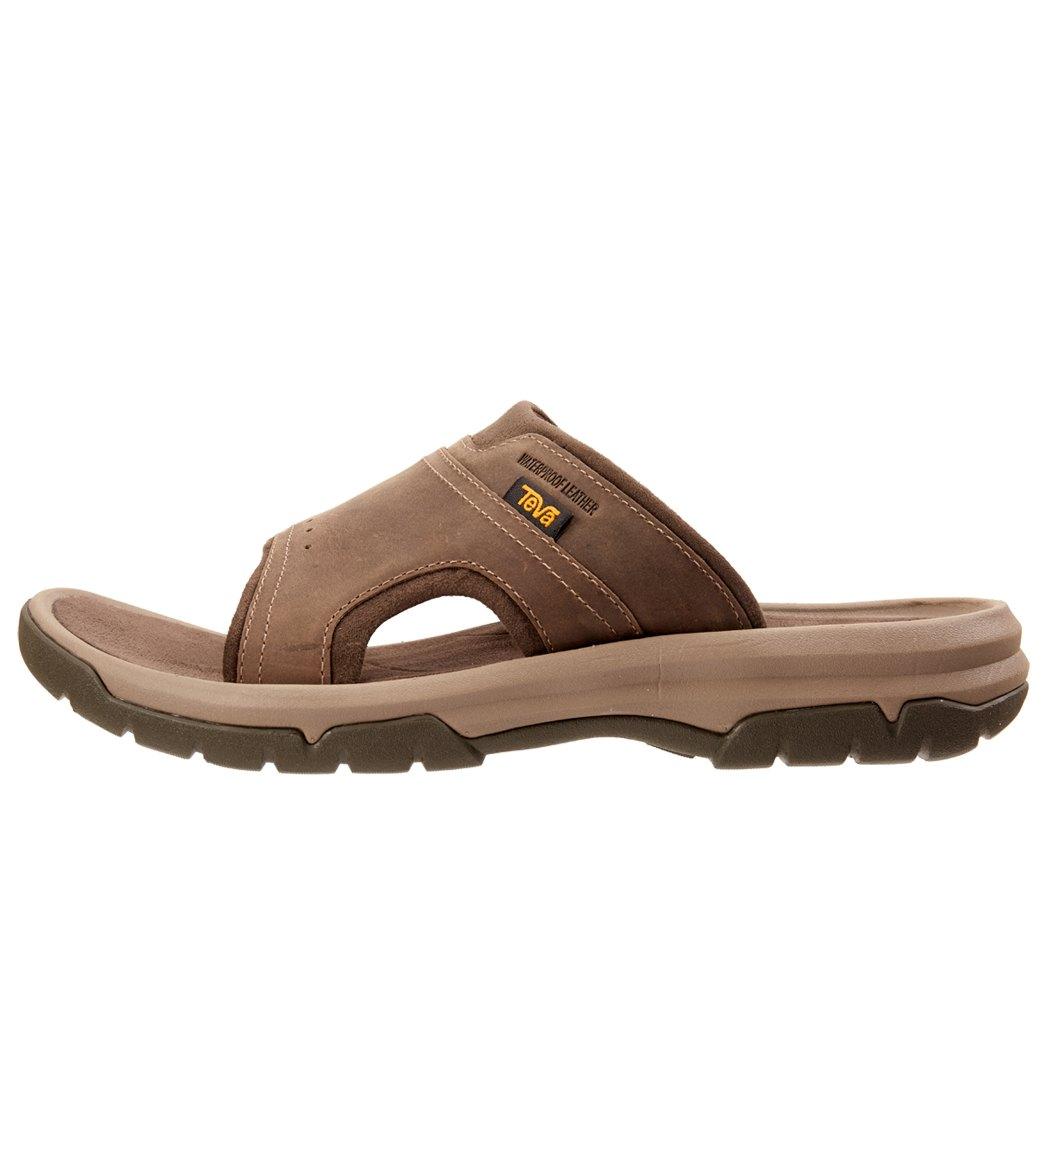 5aa19bc22737 Teva Men s Langdon Slide Sandal at SwimOutlet.com - Free Shipping